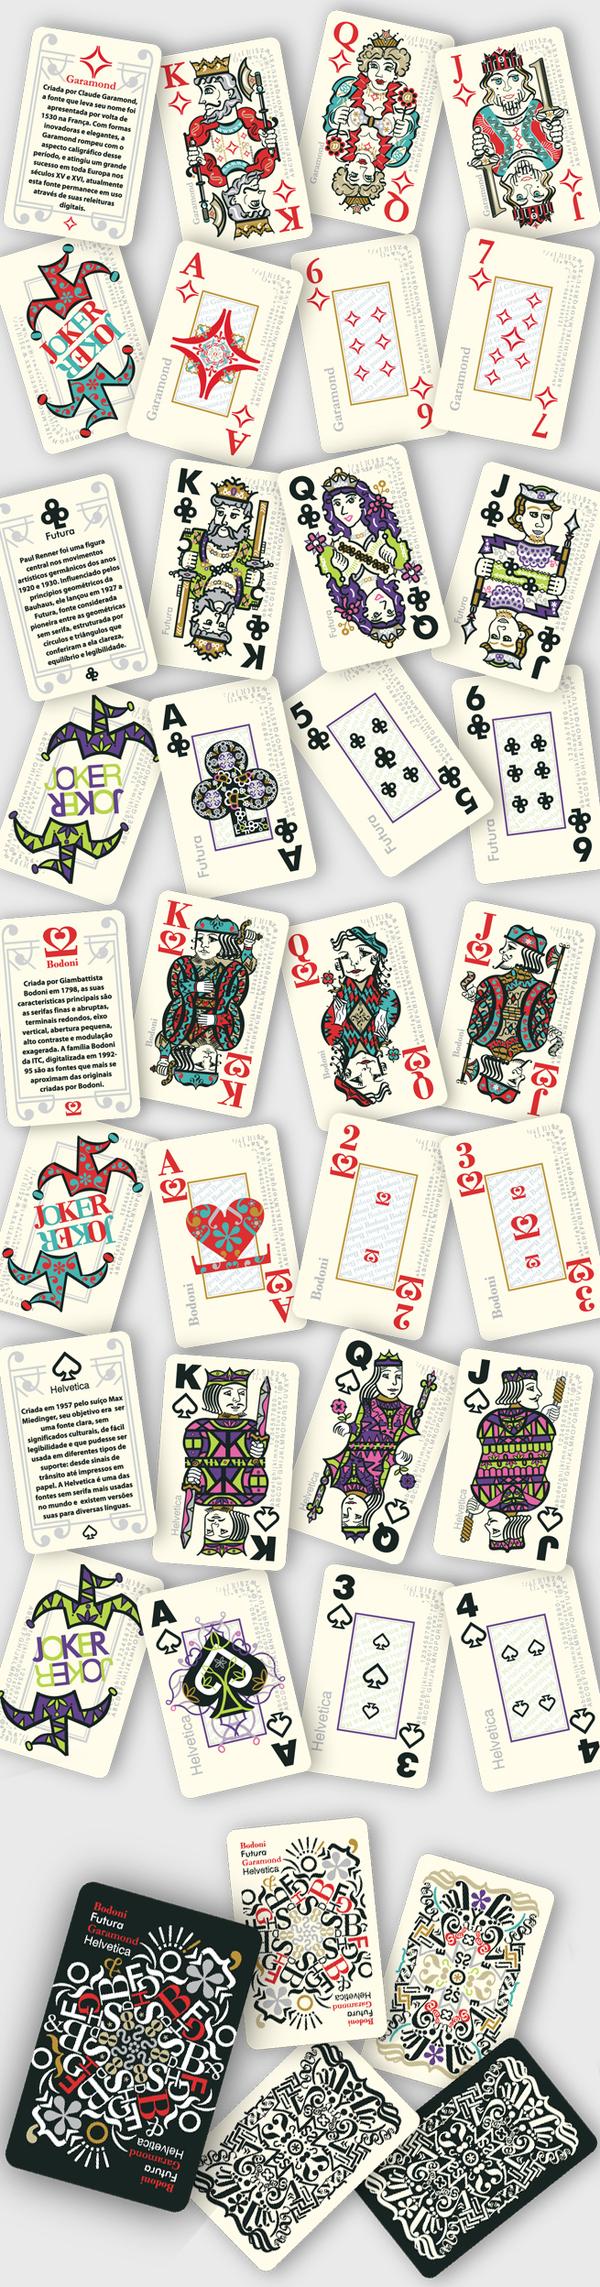 Baralho Tipográfico - Typographic deck by Adriana Amaral Pepplow, via Behance